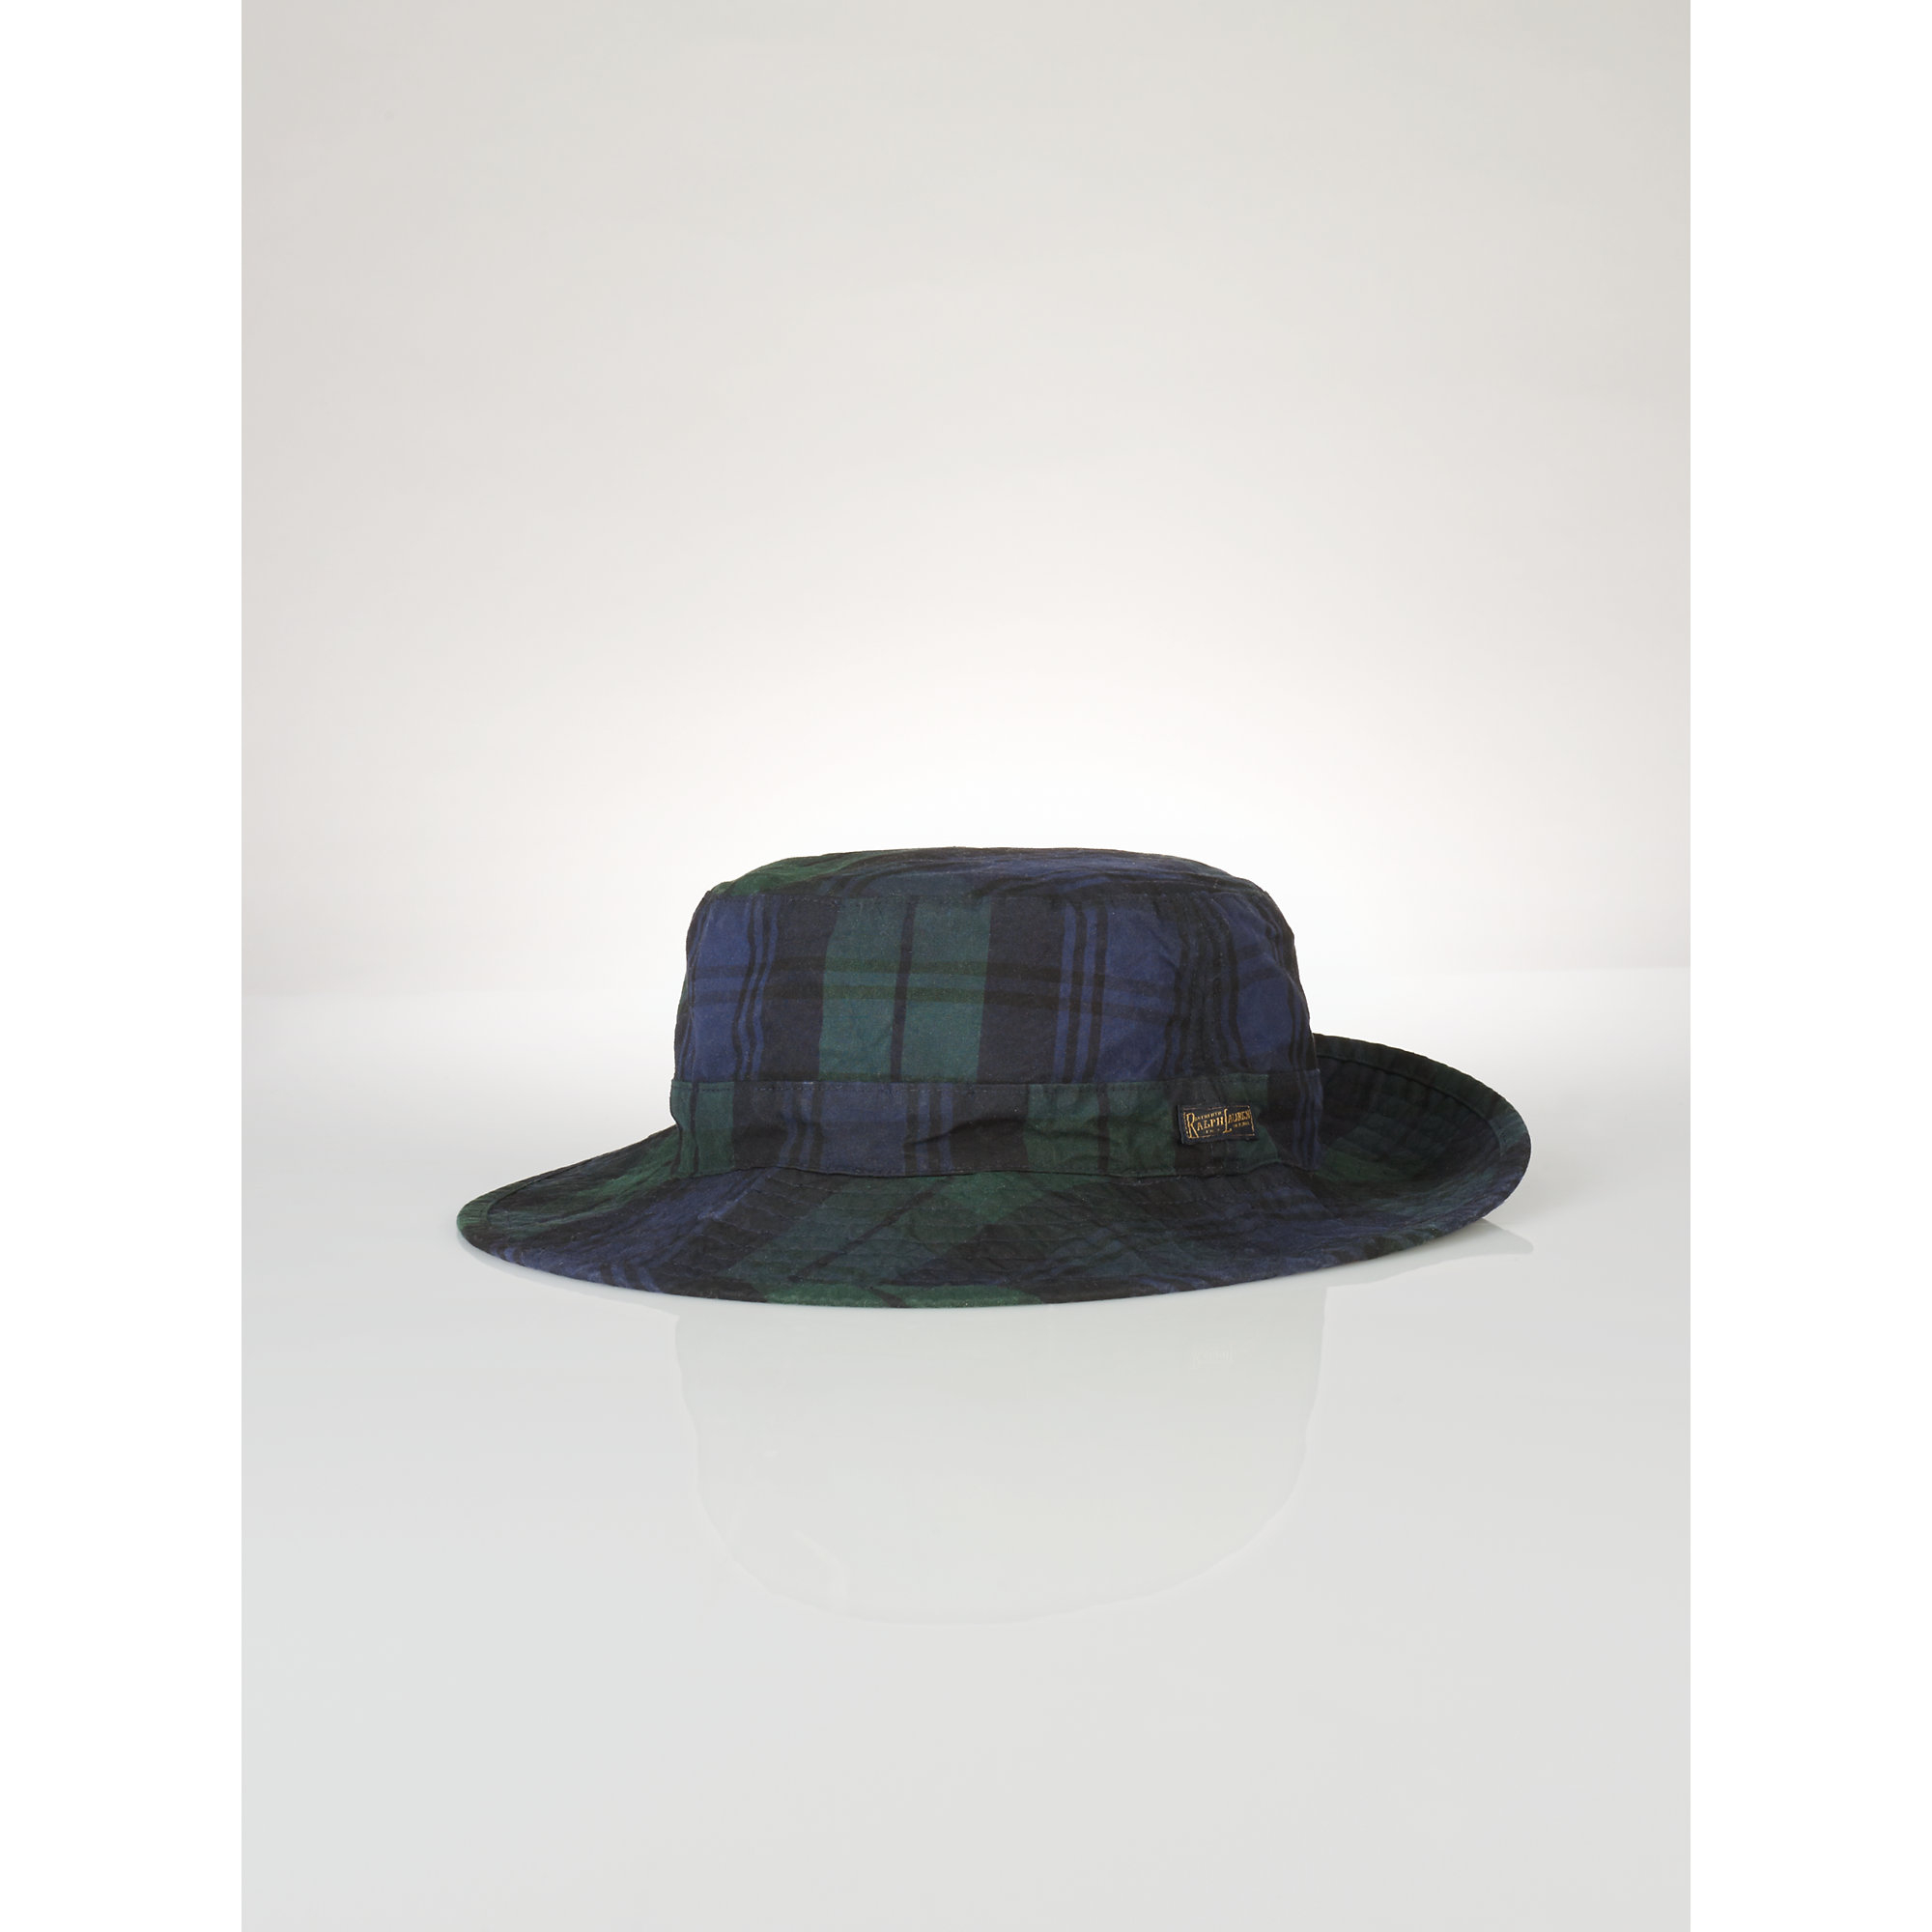 Lyst - Polo Ralph Lauren Blackwatch Oilcloth Bucket Hat in Blue for Men f133fff1a72a